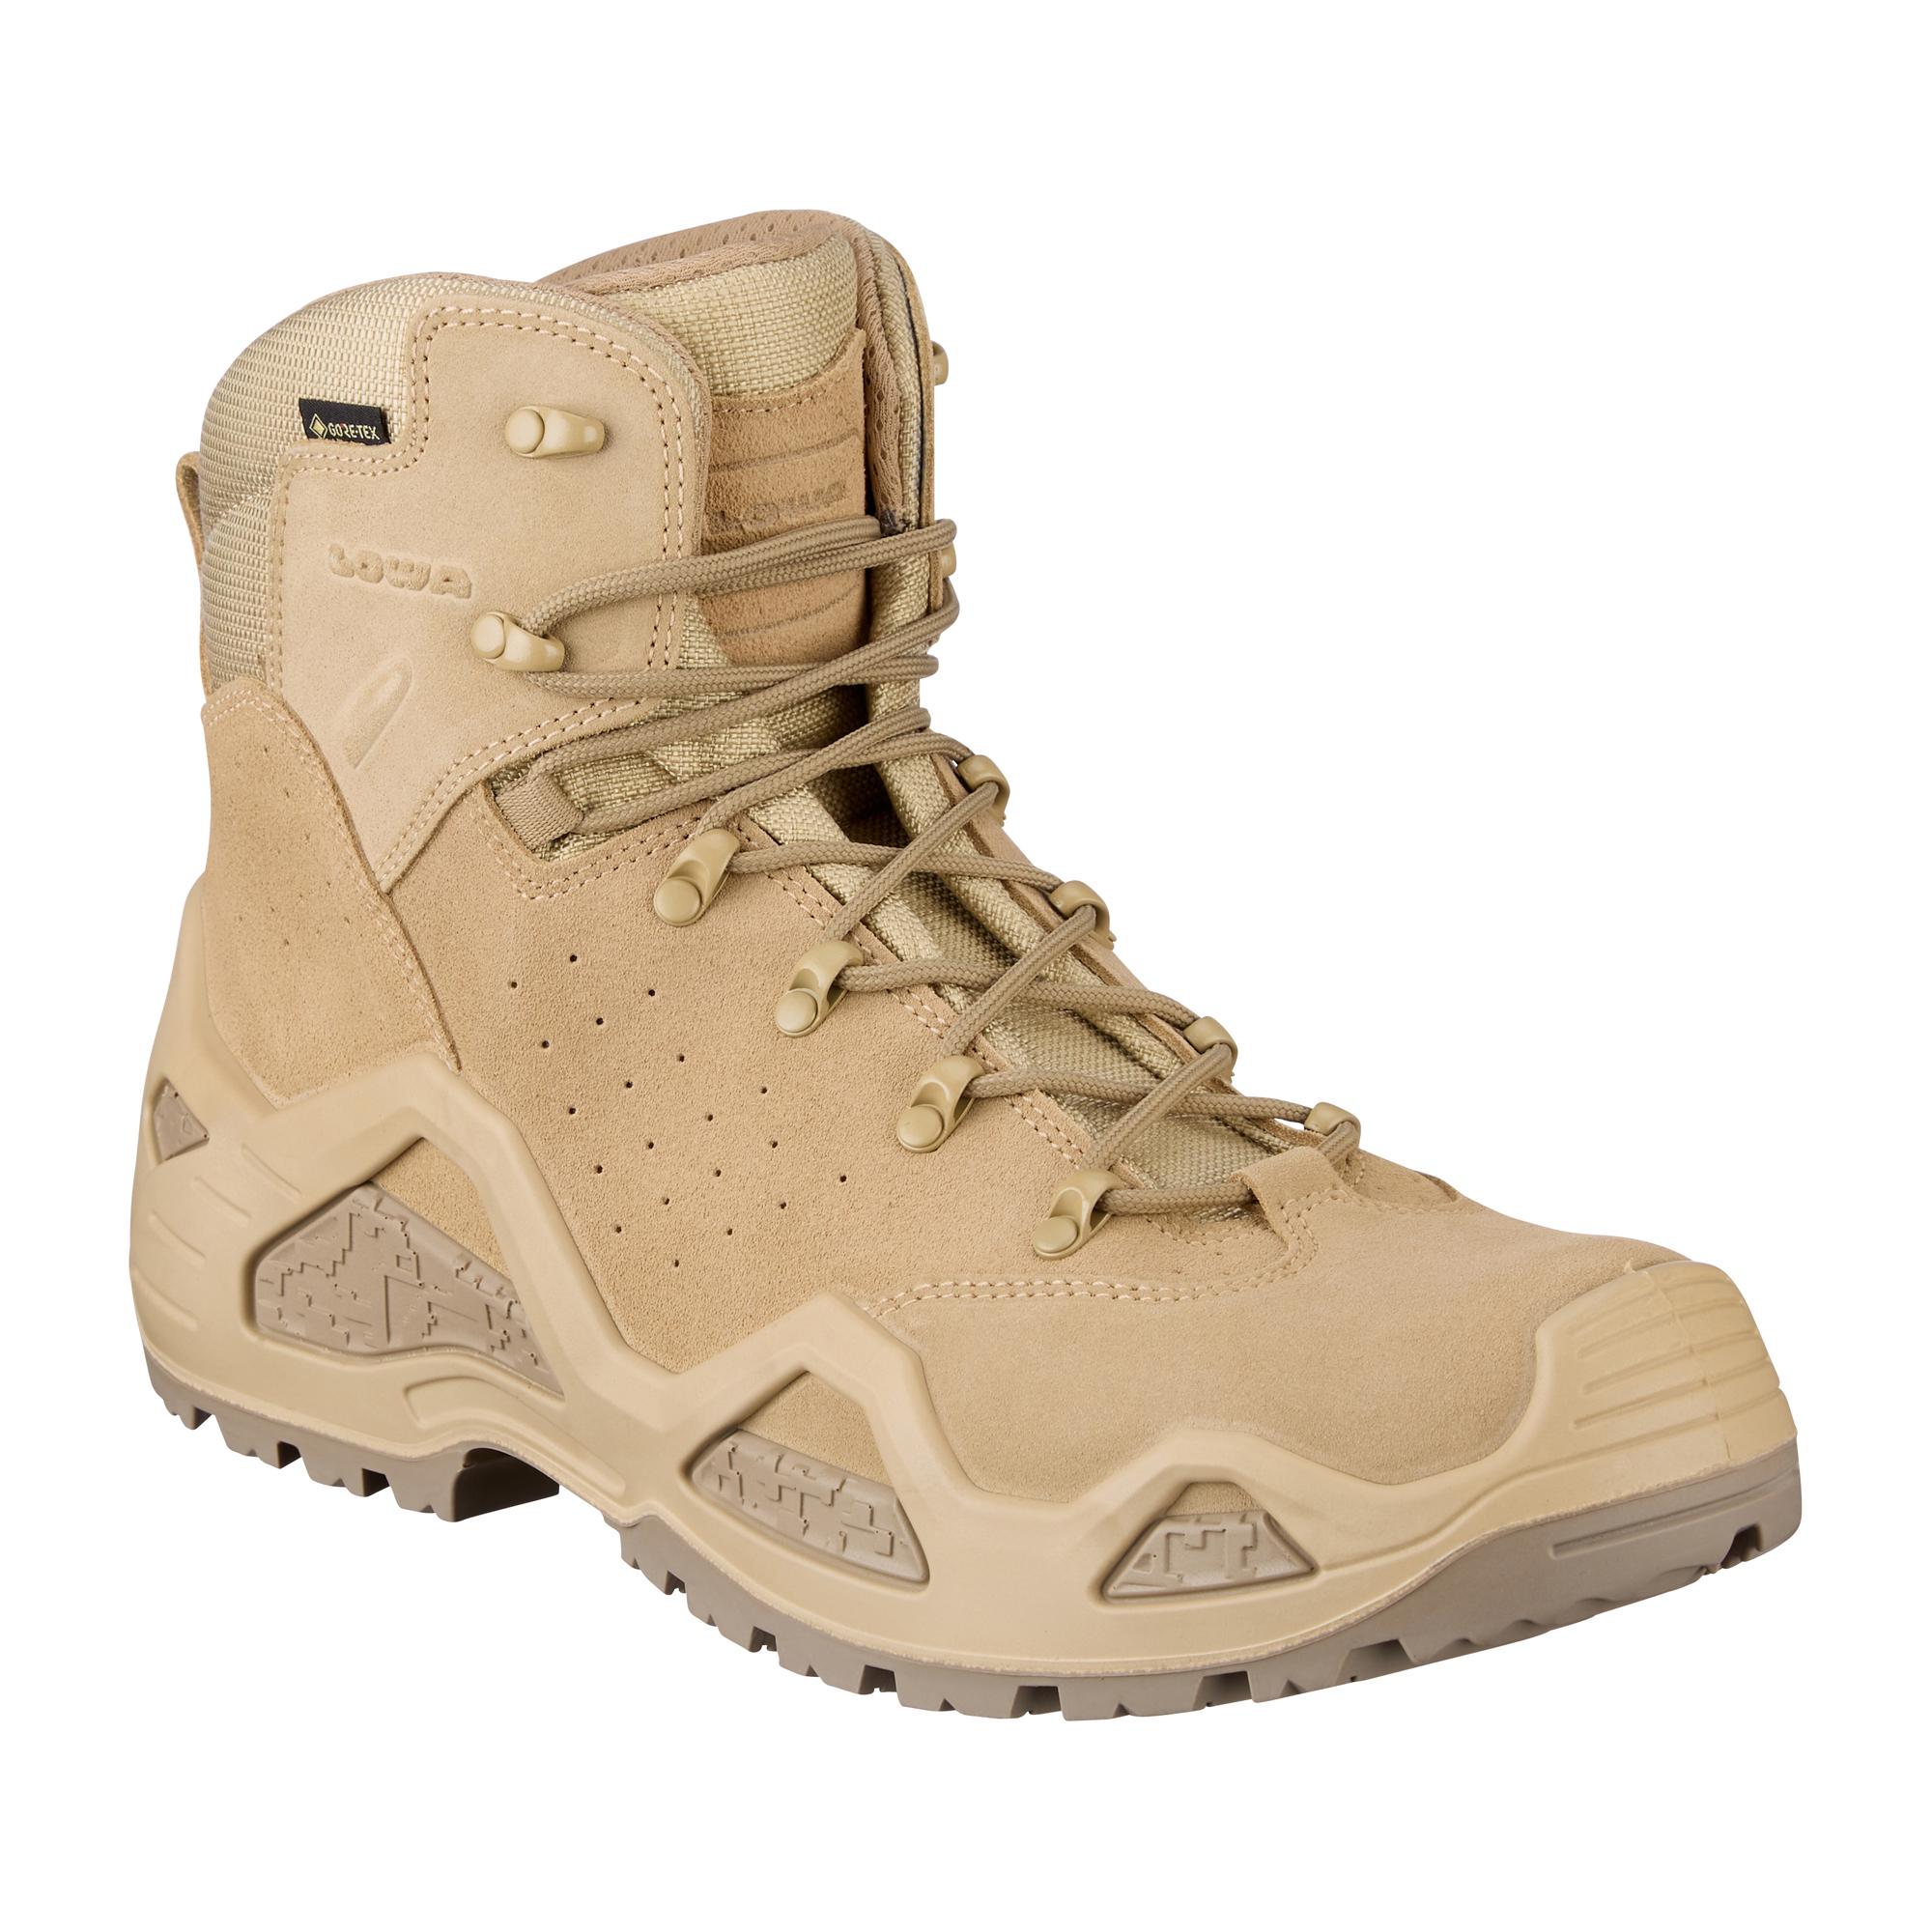 LOWA Boots Z-6S GTX C desert by ASMC